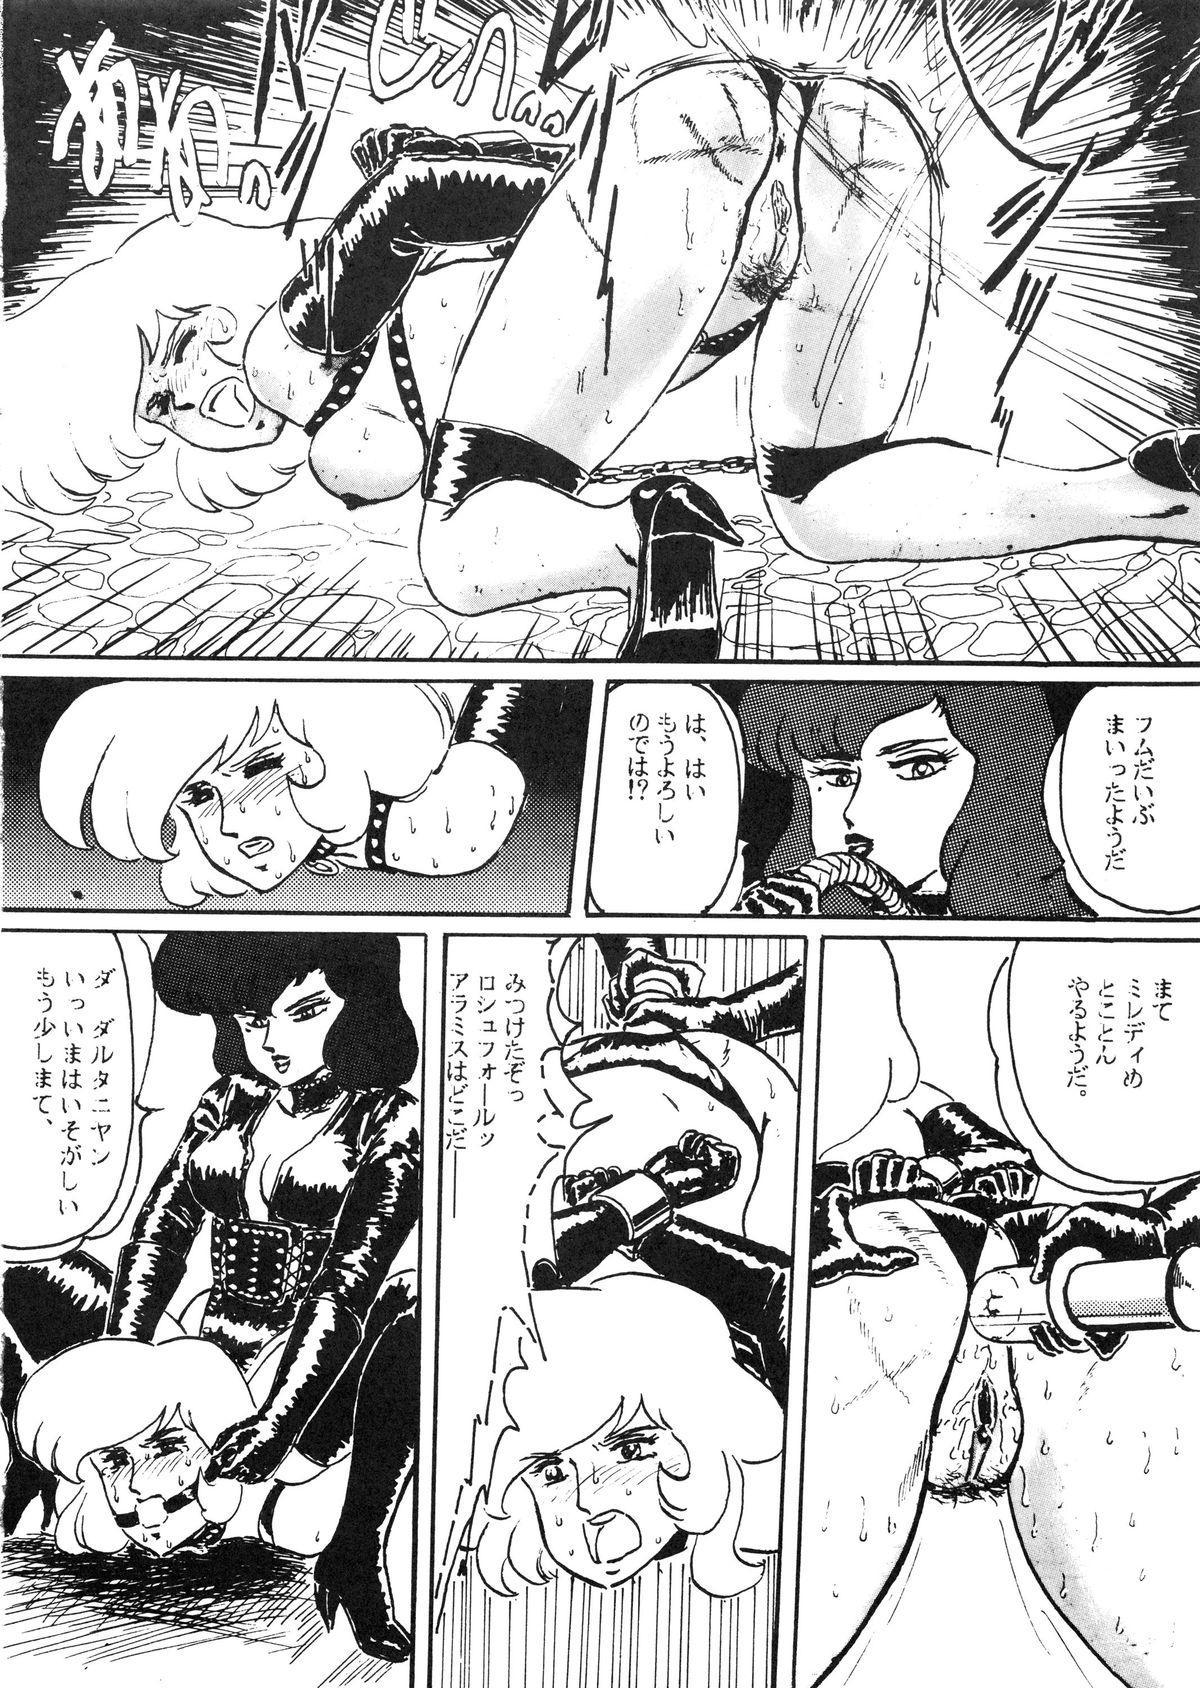 [Secret Society Chi (Iijima Mario)] Kai II - Iijima Mario Kojin-shi - (Various) 26